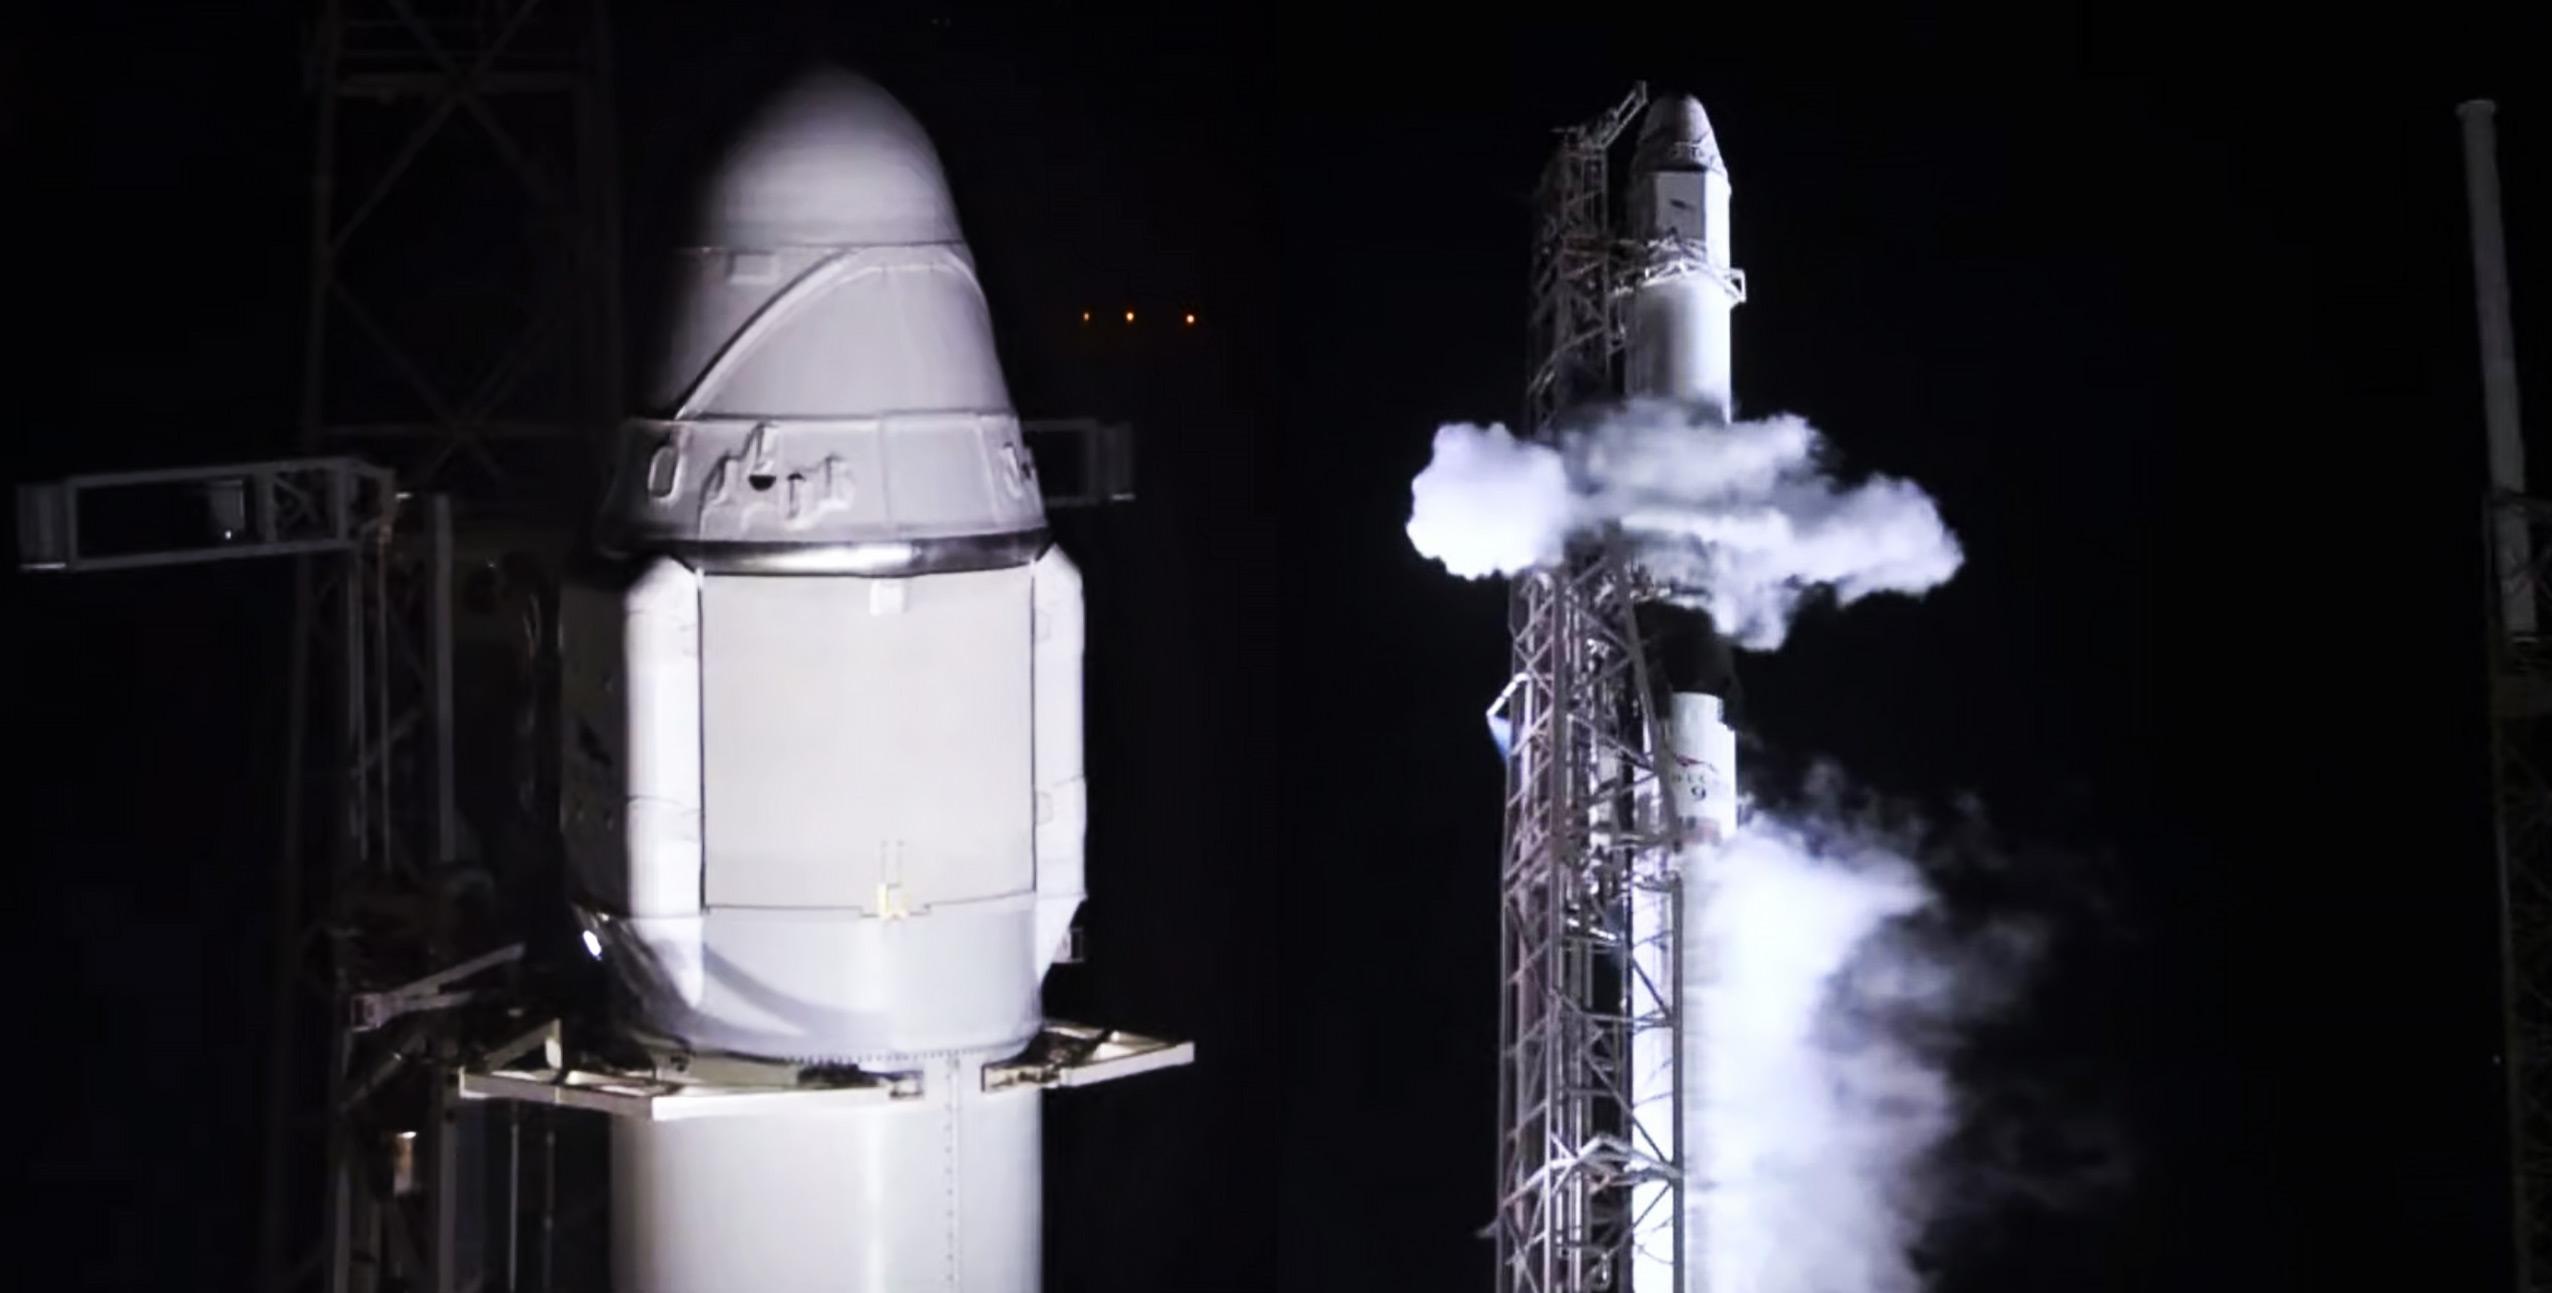 SpaceX scrubs Cargo Dragon, Falcon 9 launch due to drone ...